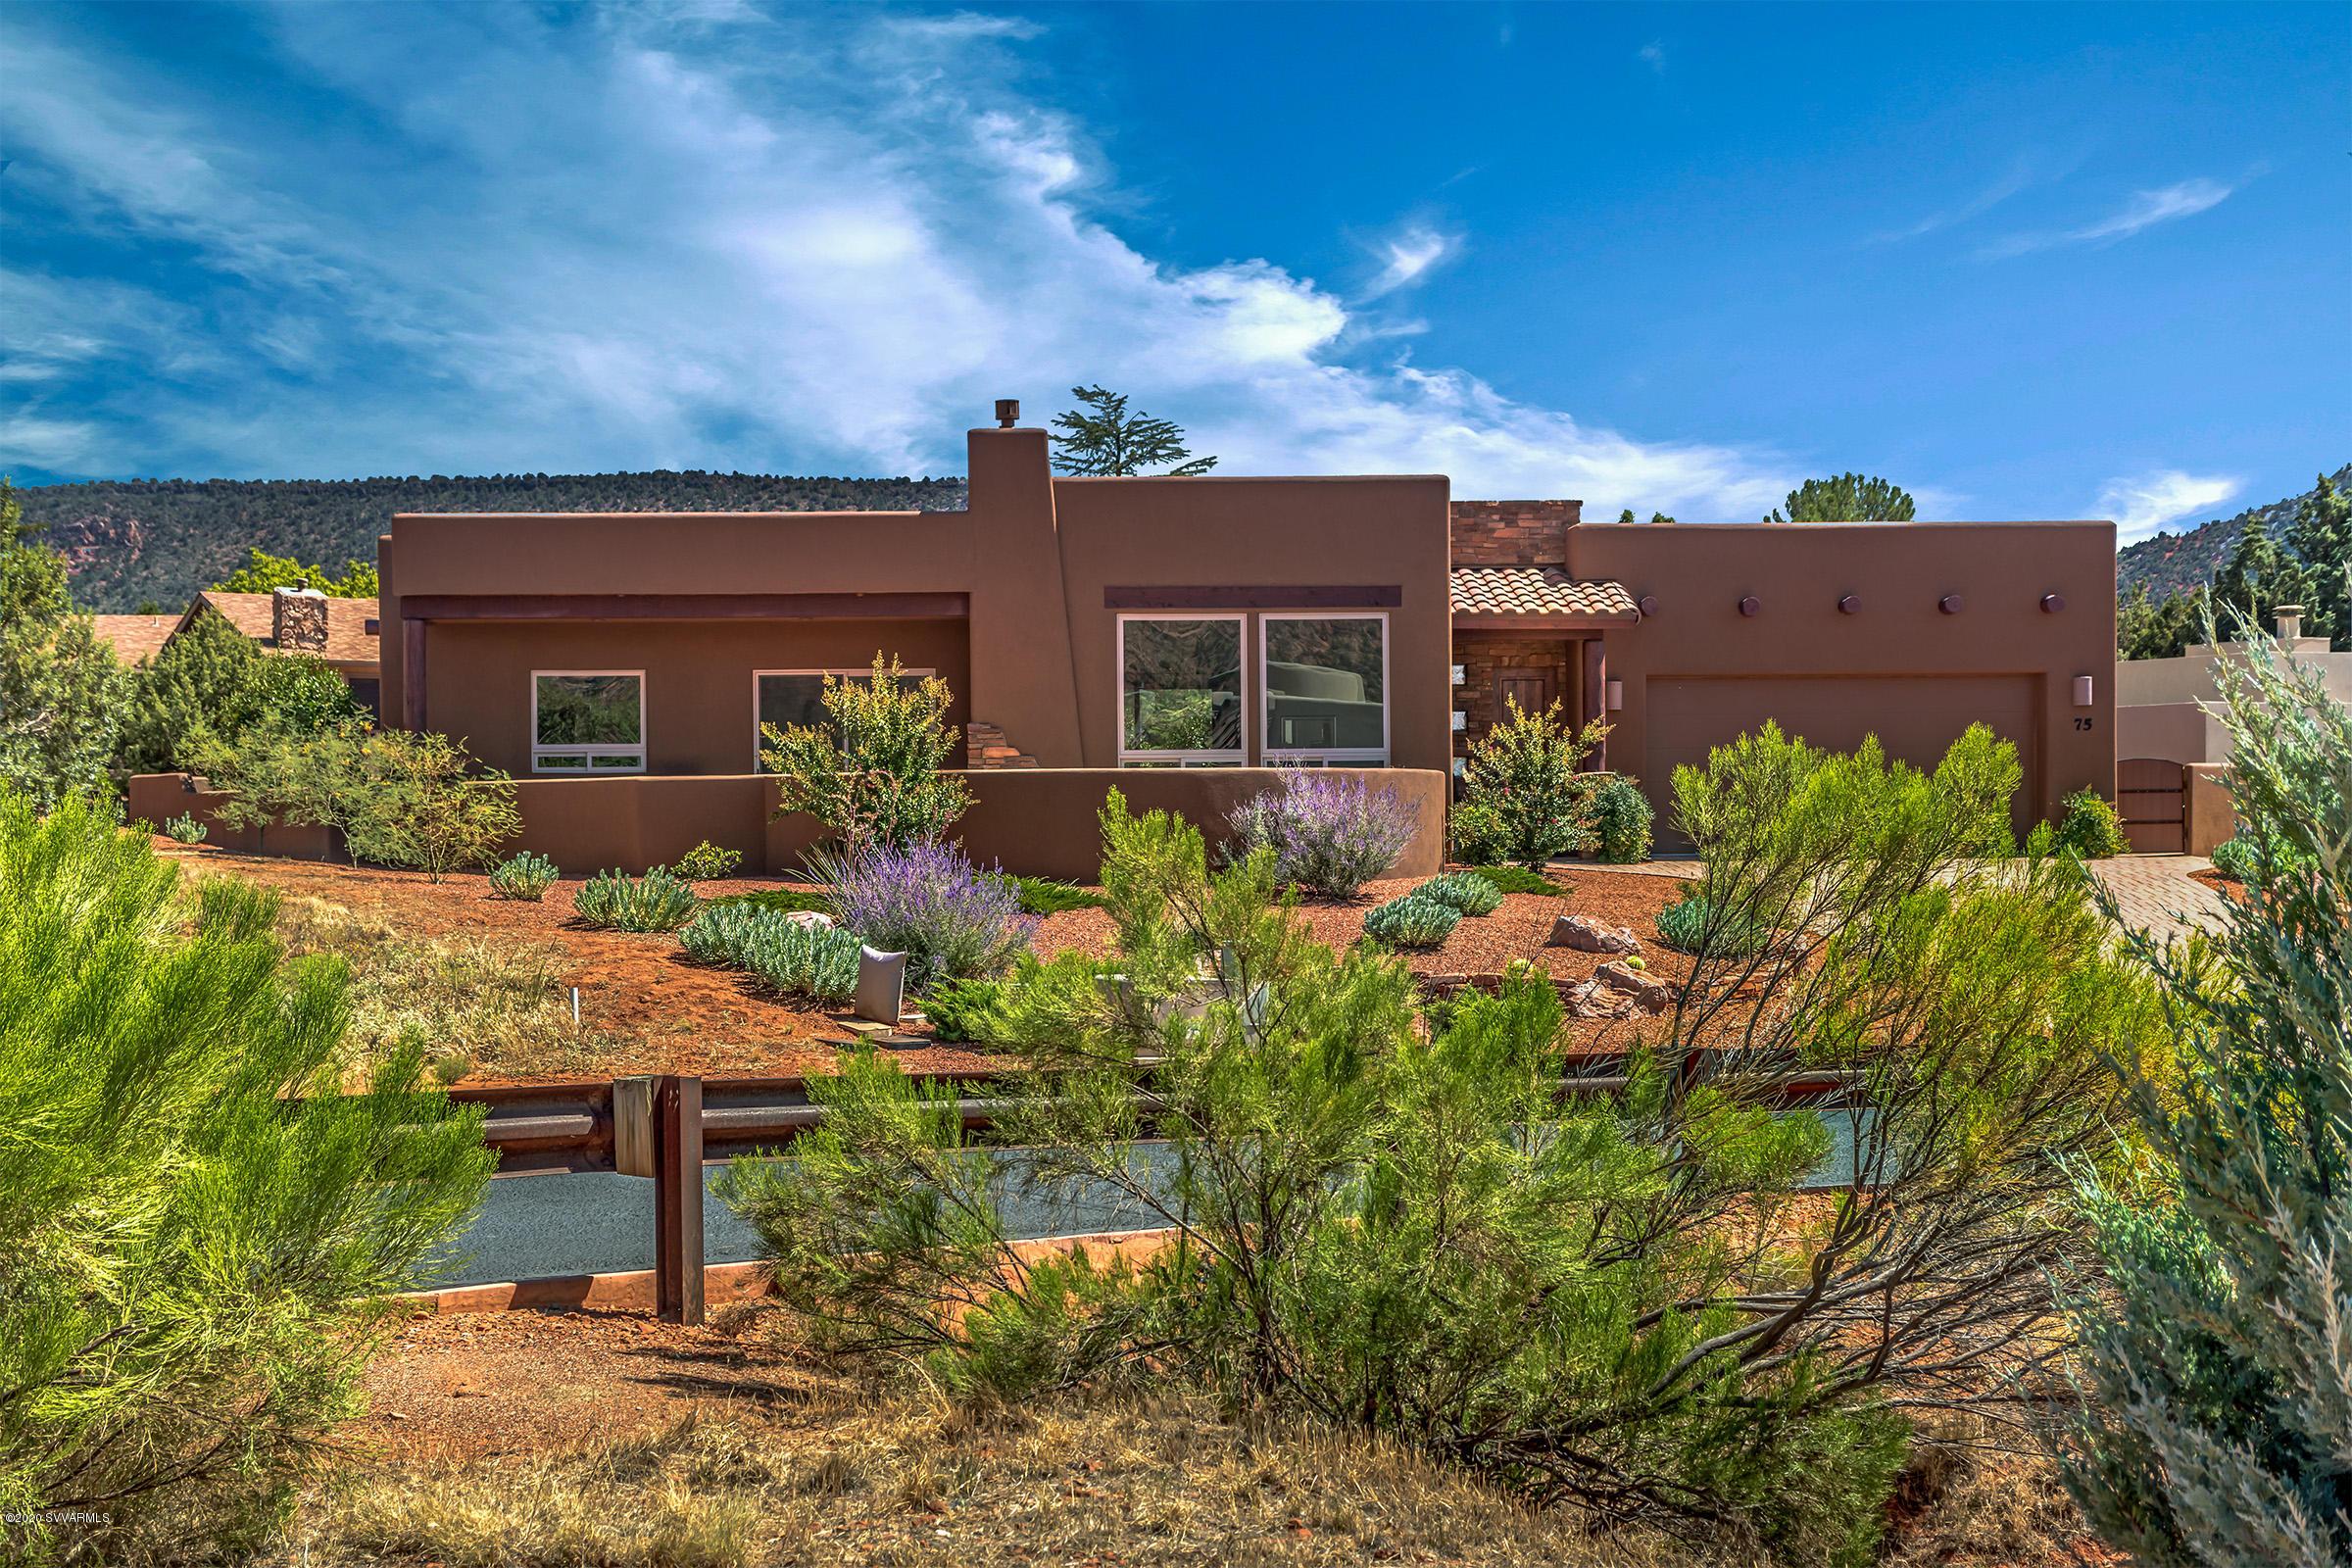 75 Overlook Way Sedona, AZ 86351